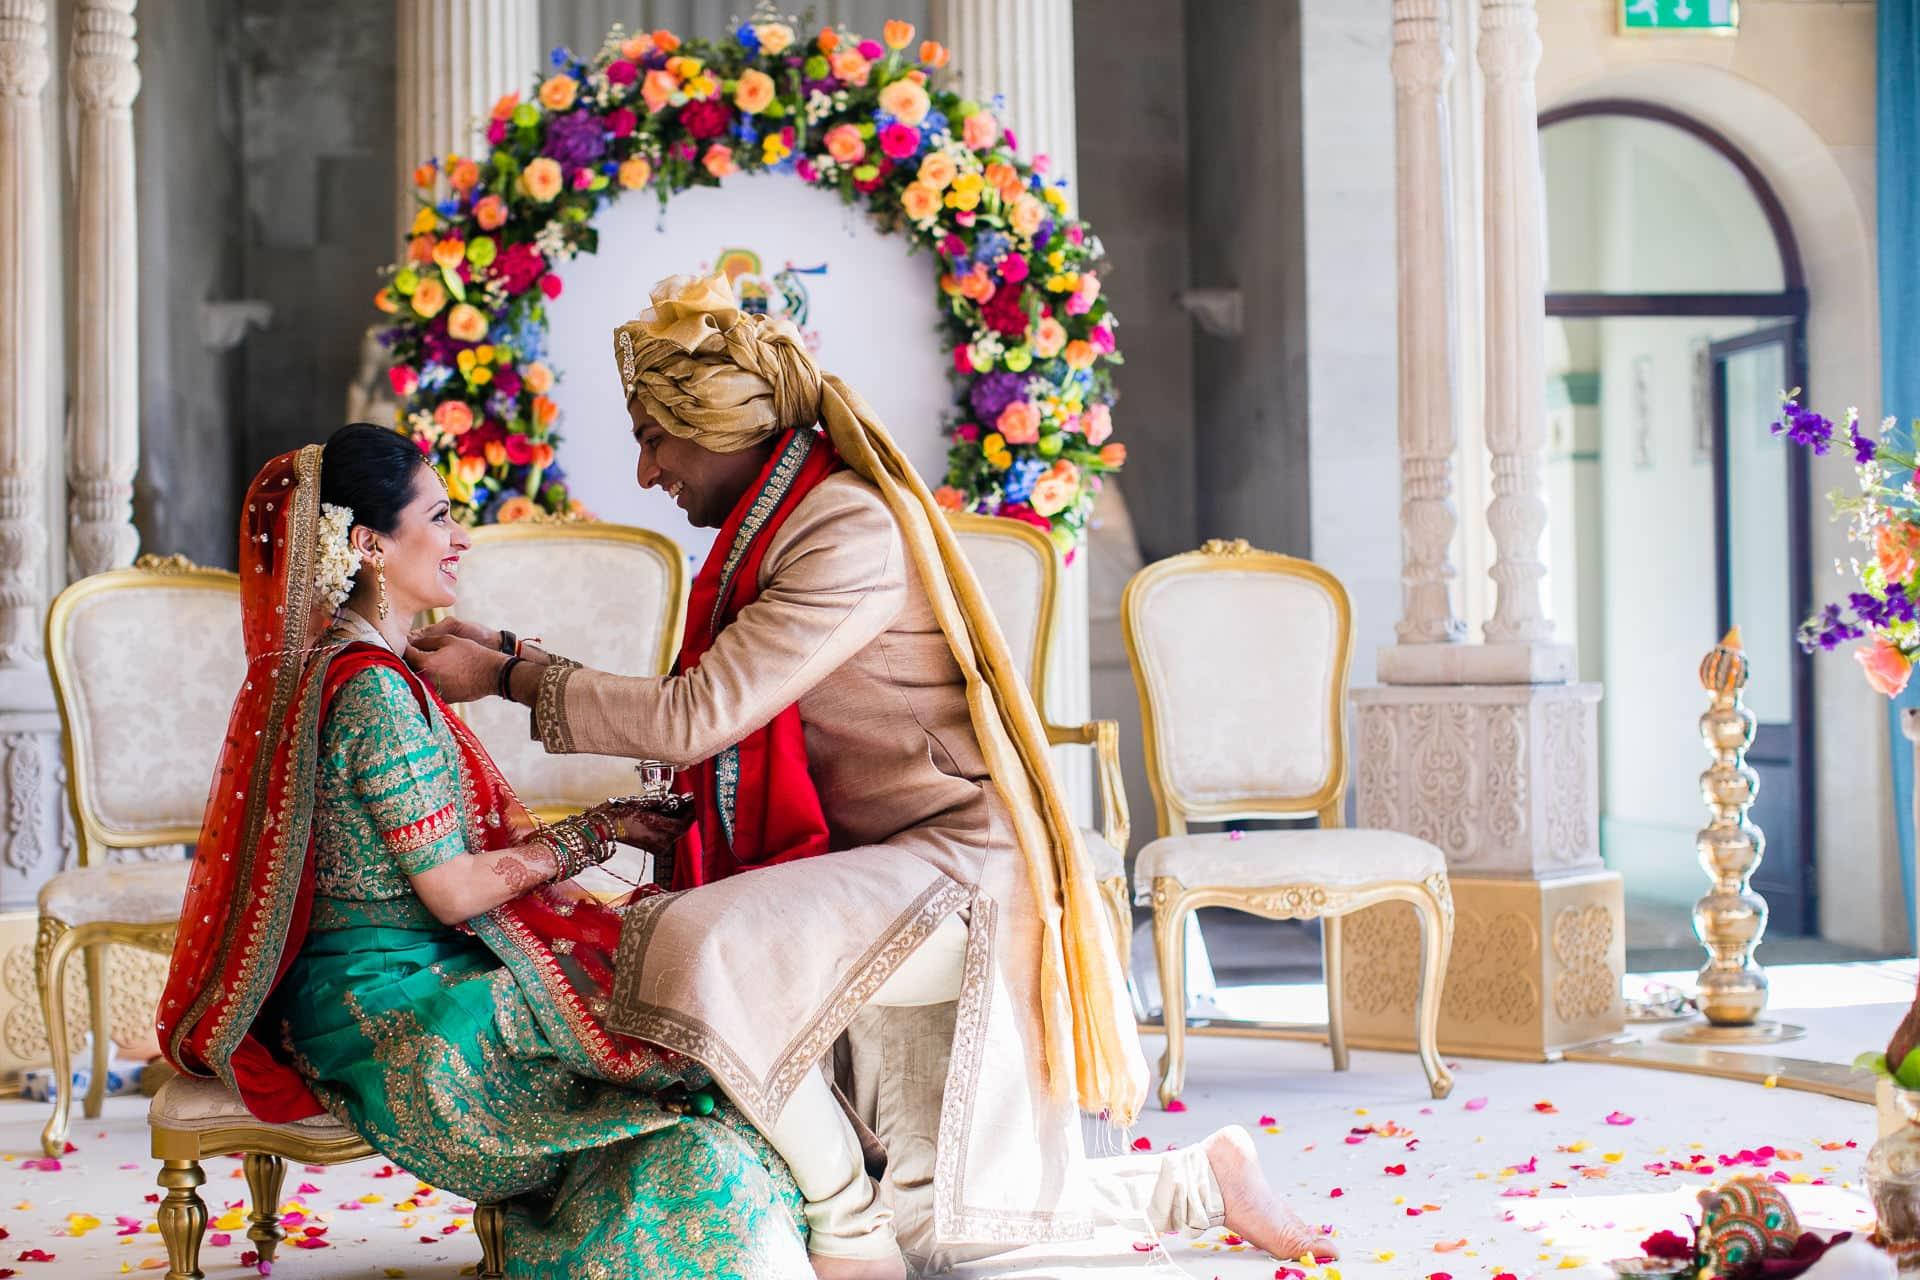 Groom putting Mangal Sutra onto bride